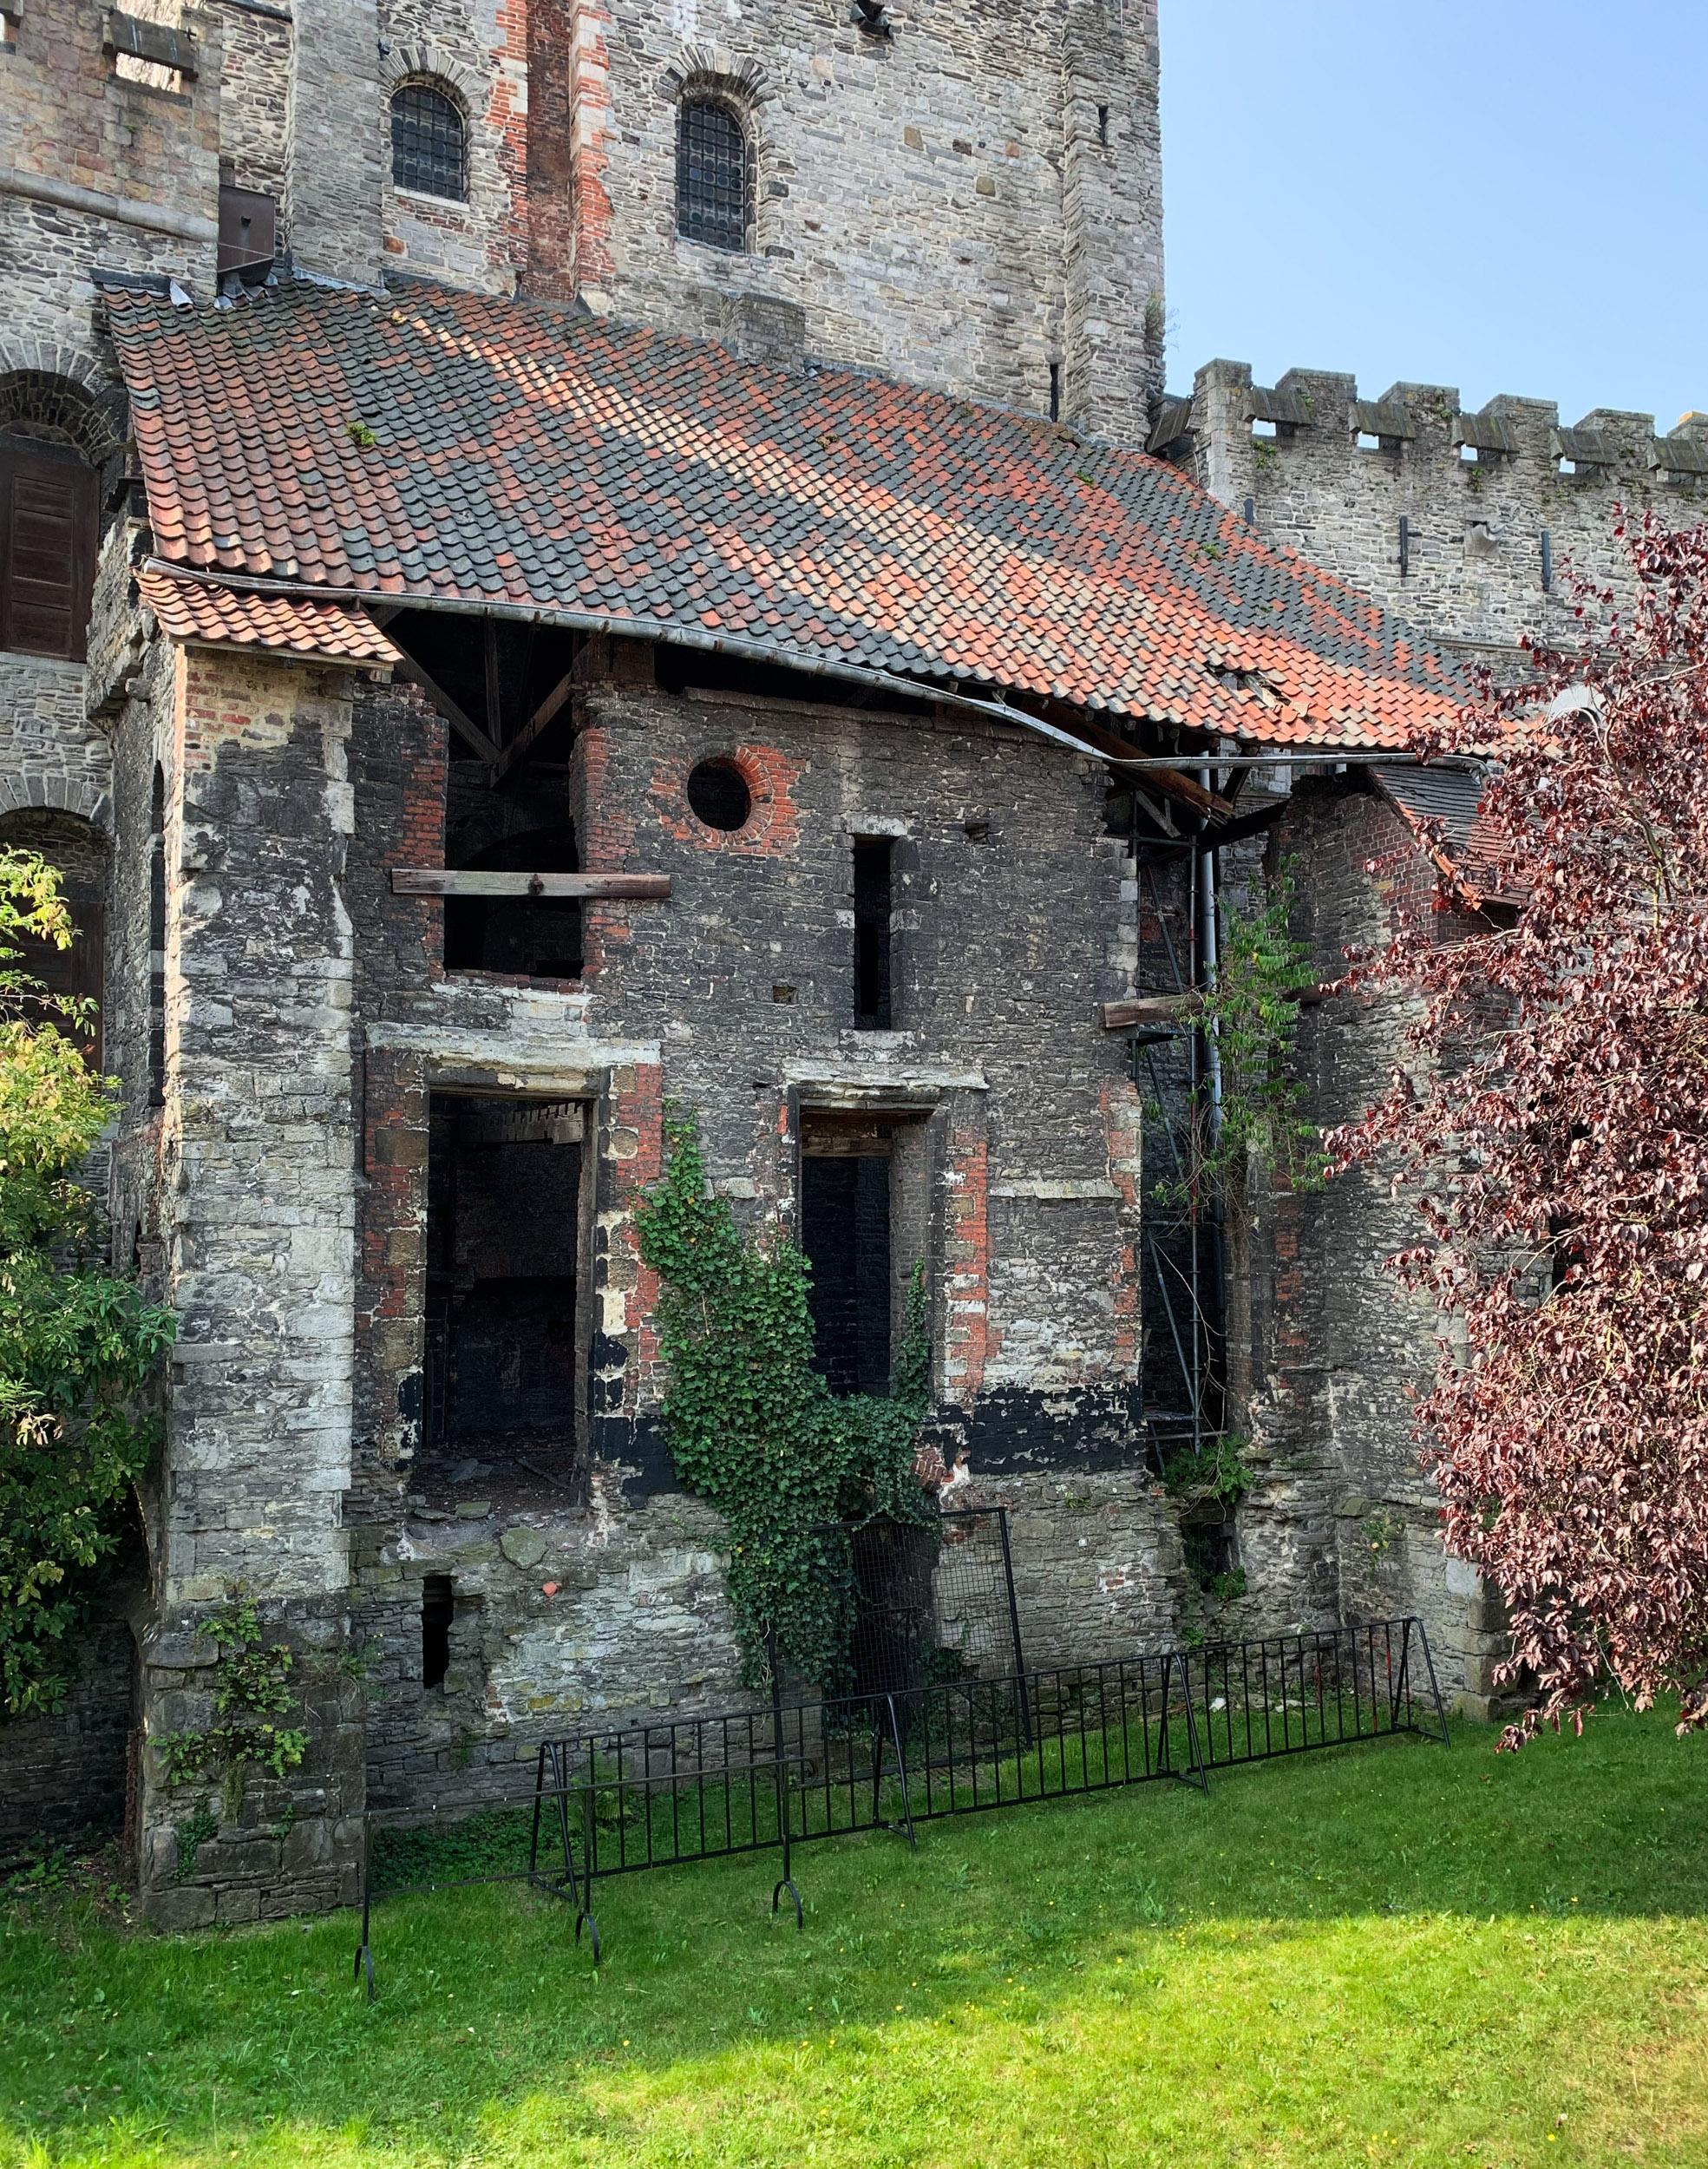 Castle of the Counts Ghent Belgium